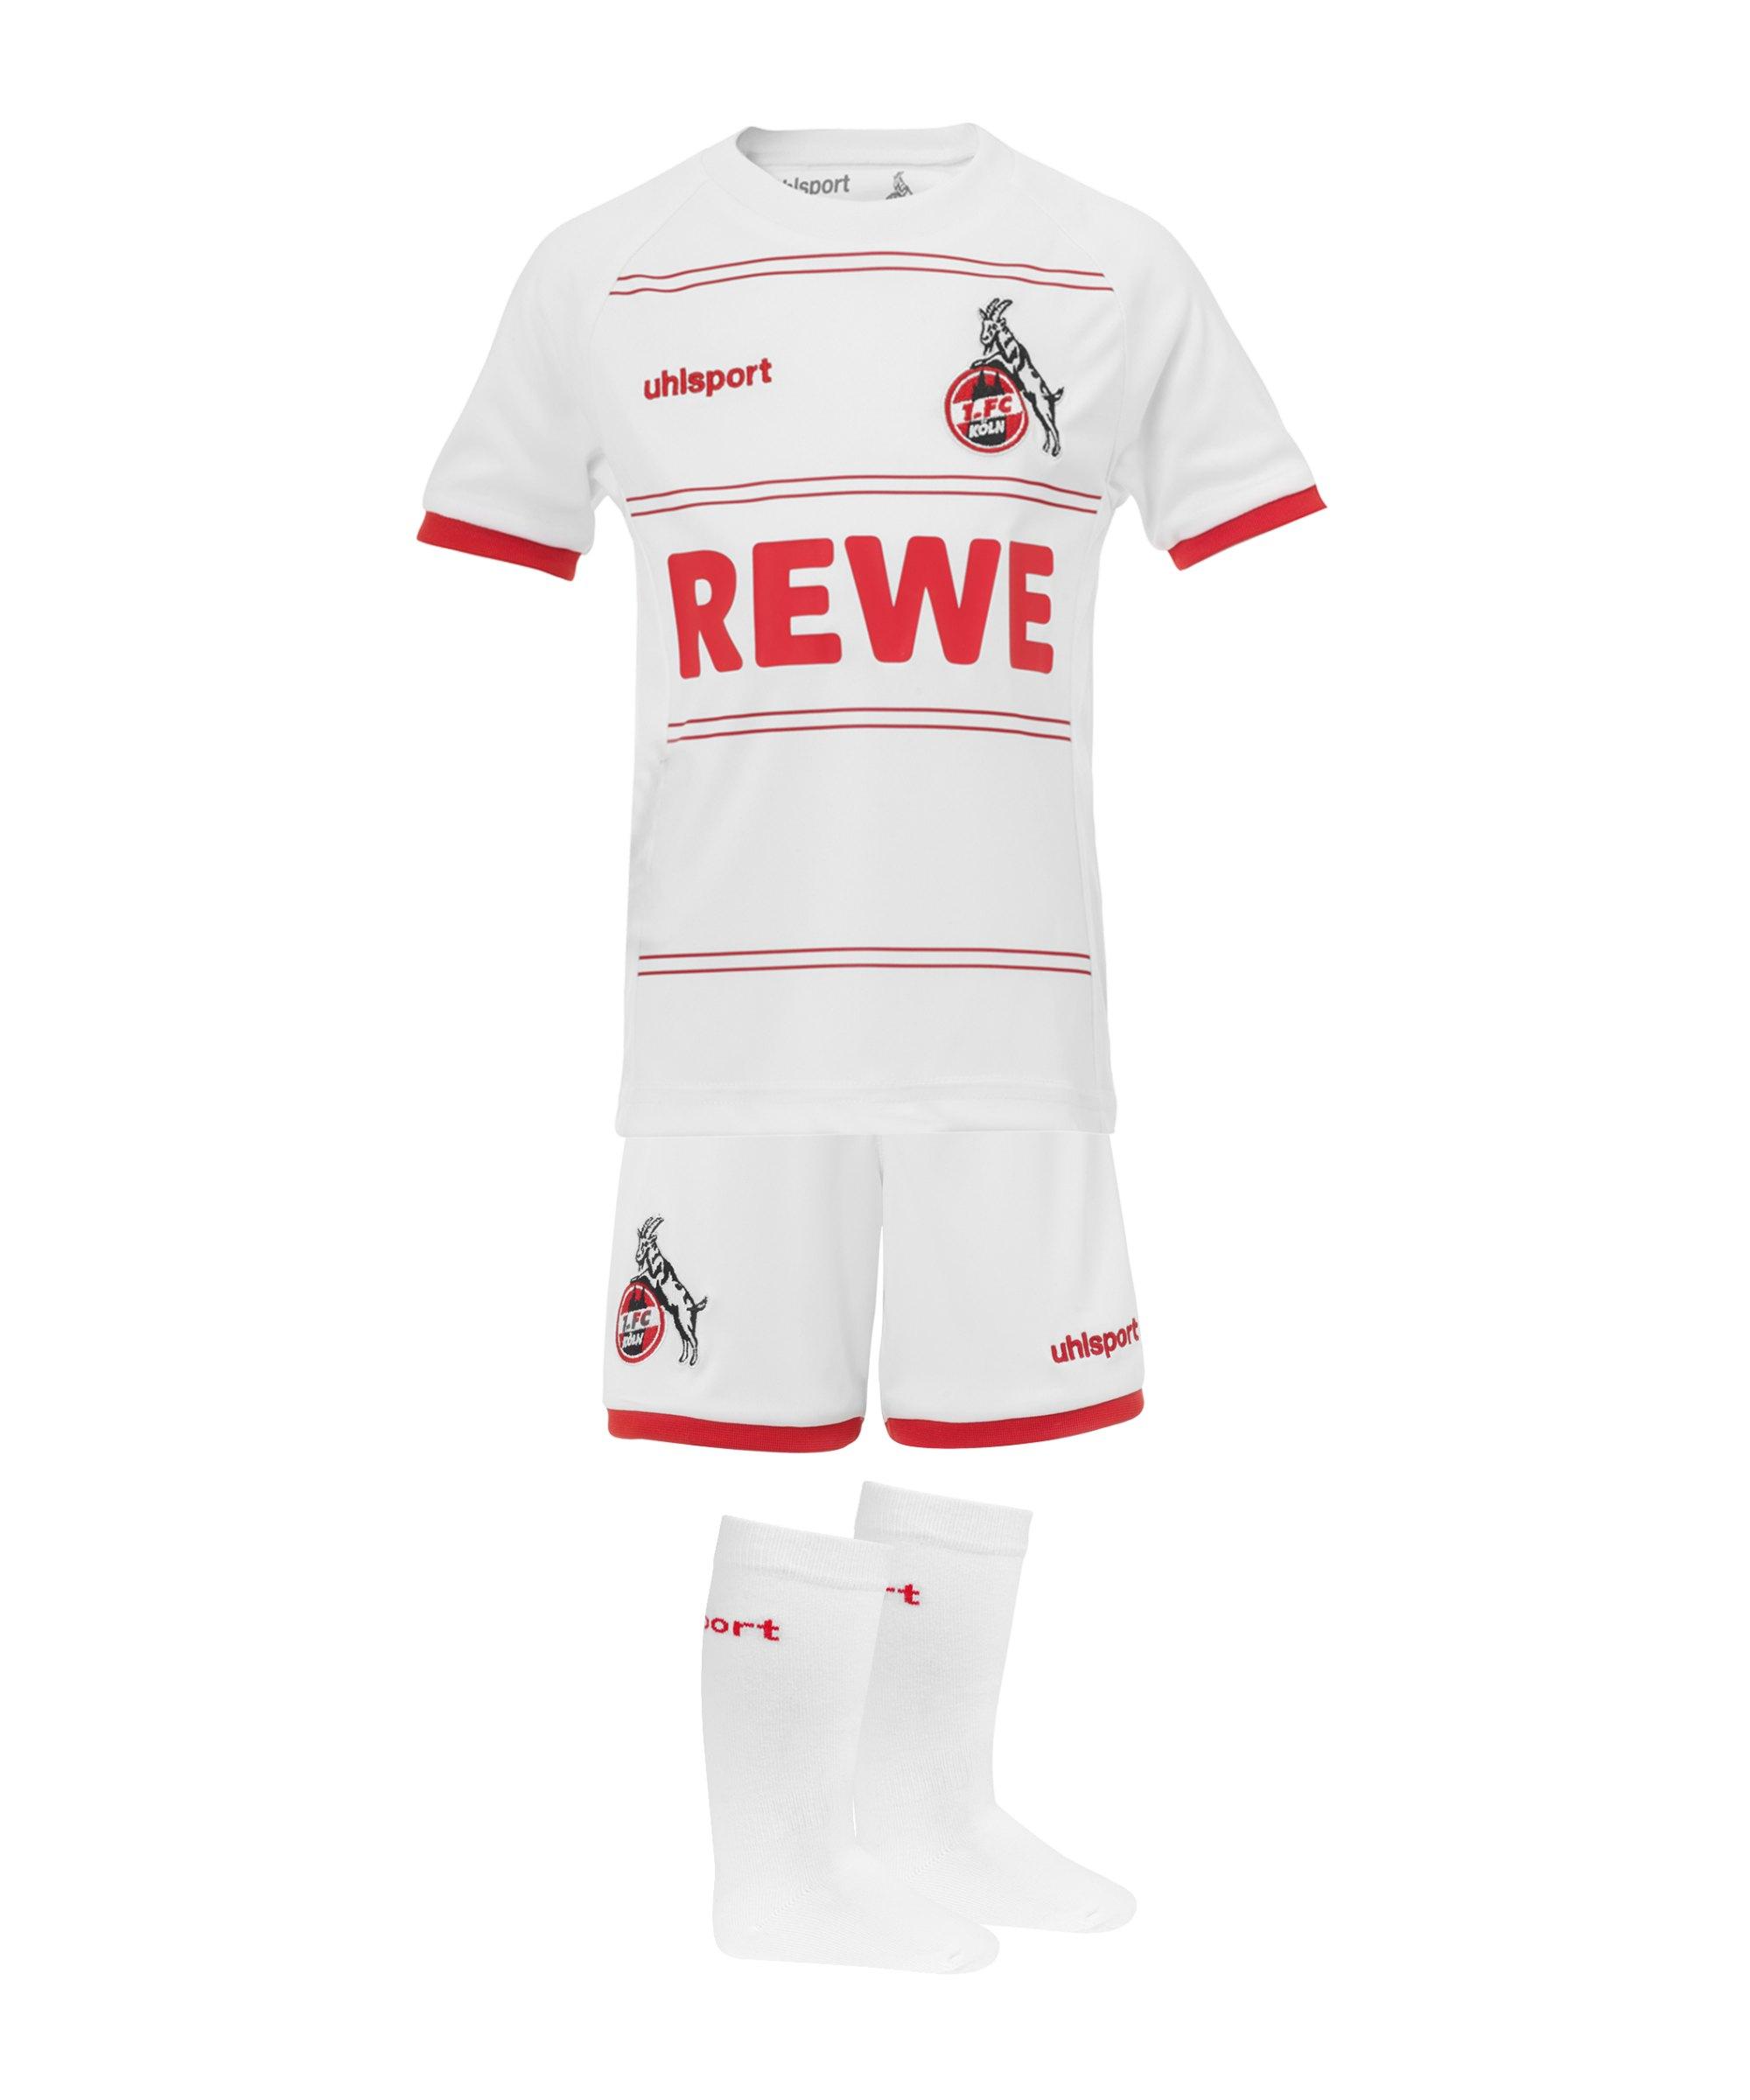 Uhlsport 1. FC Köln Mini-Kit Home 2021/2022 Weiss - weiss